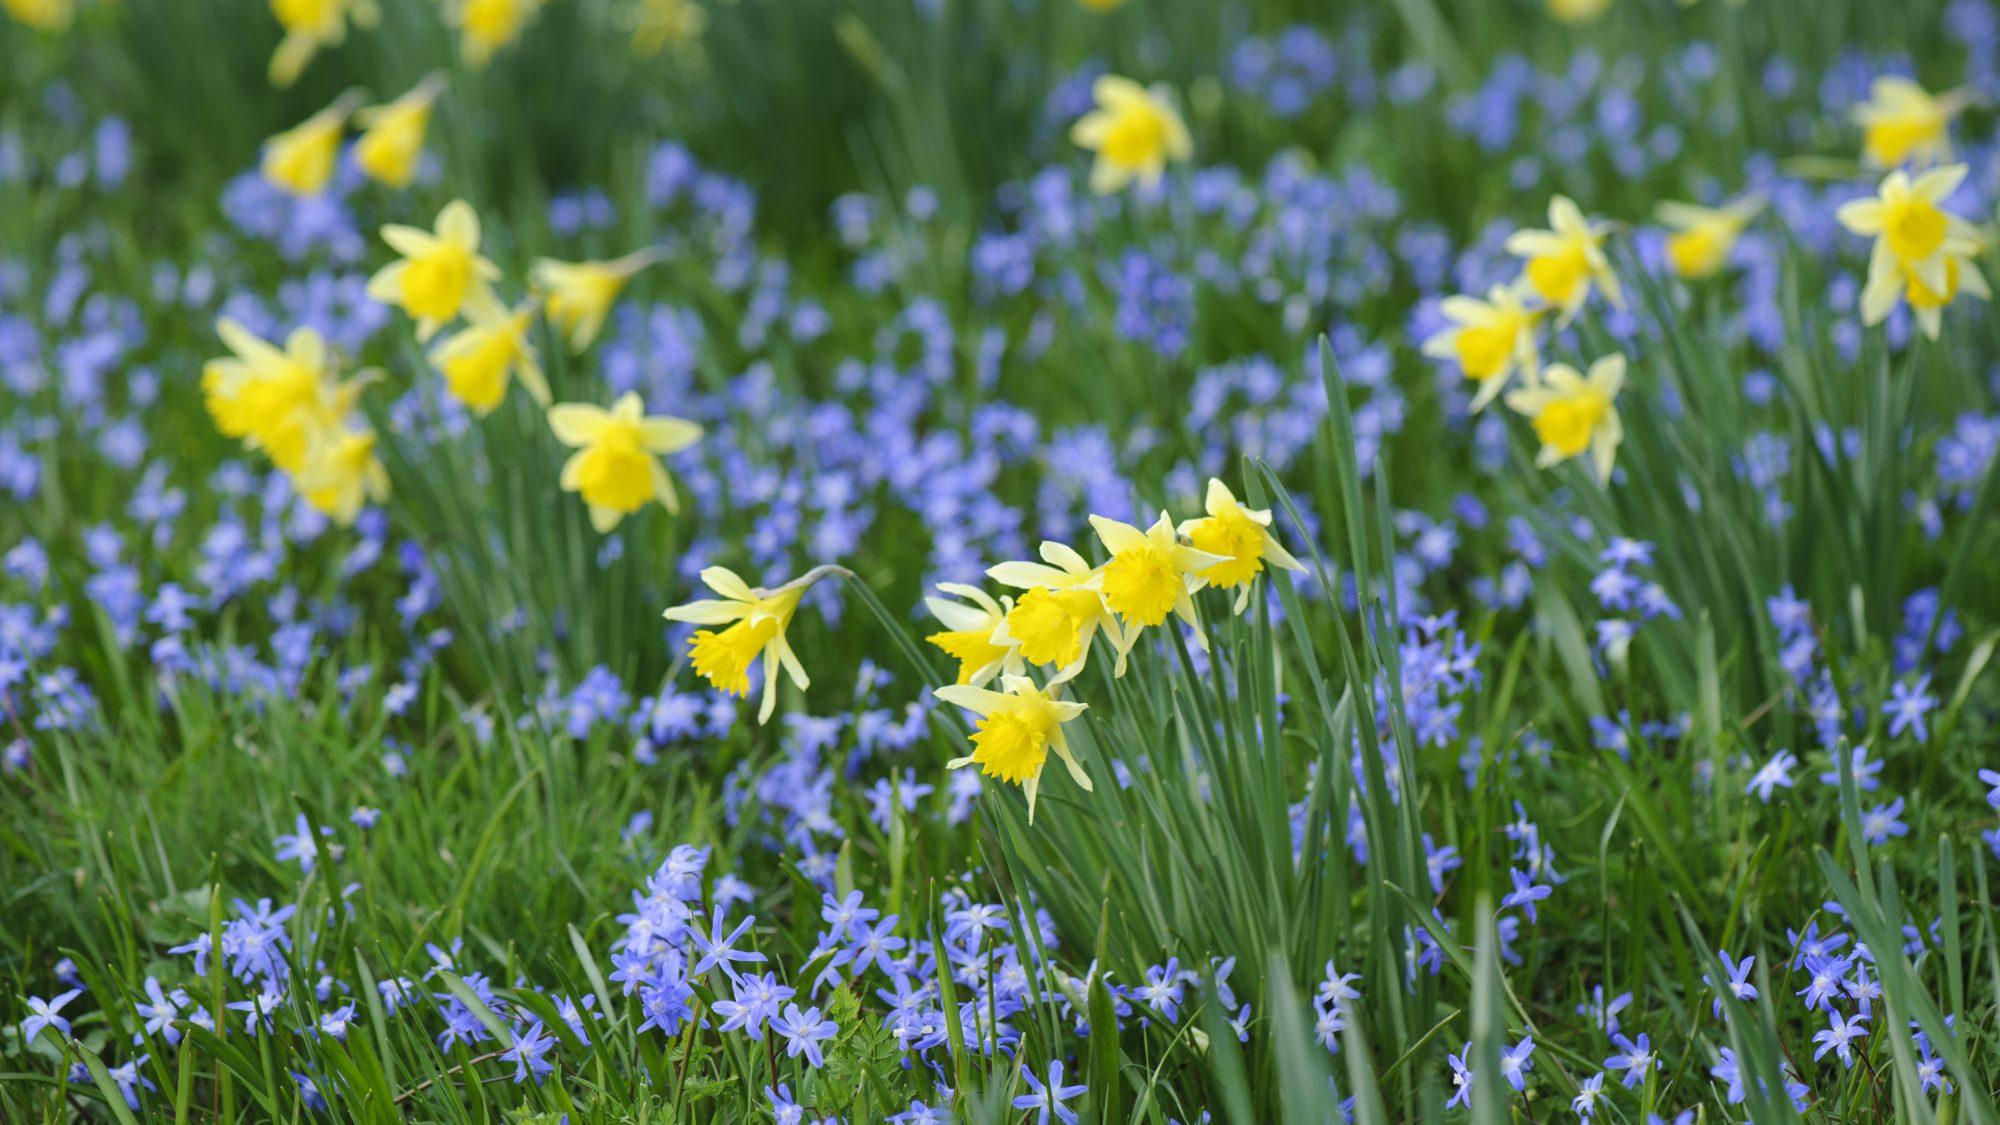 Narcissus interplanted with Scilla.